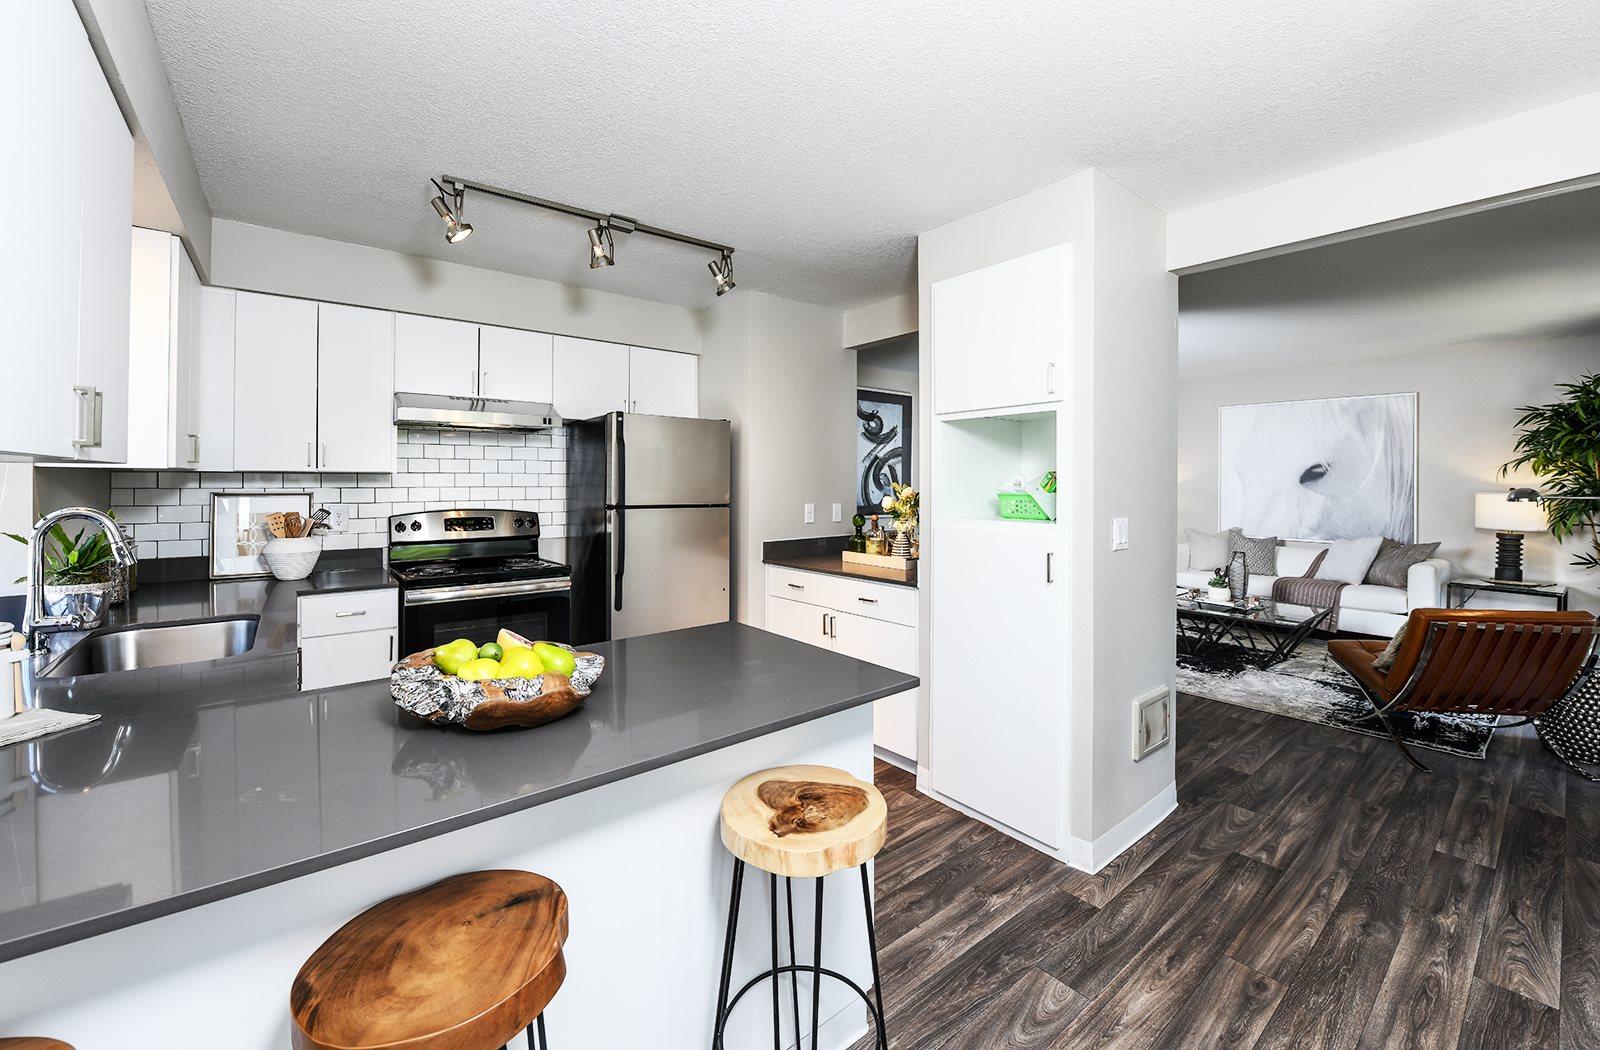 apartments for rent in portland oregon montclair terrace apartments